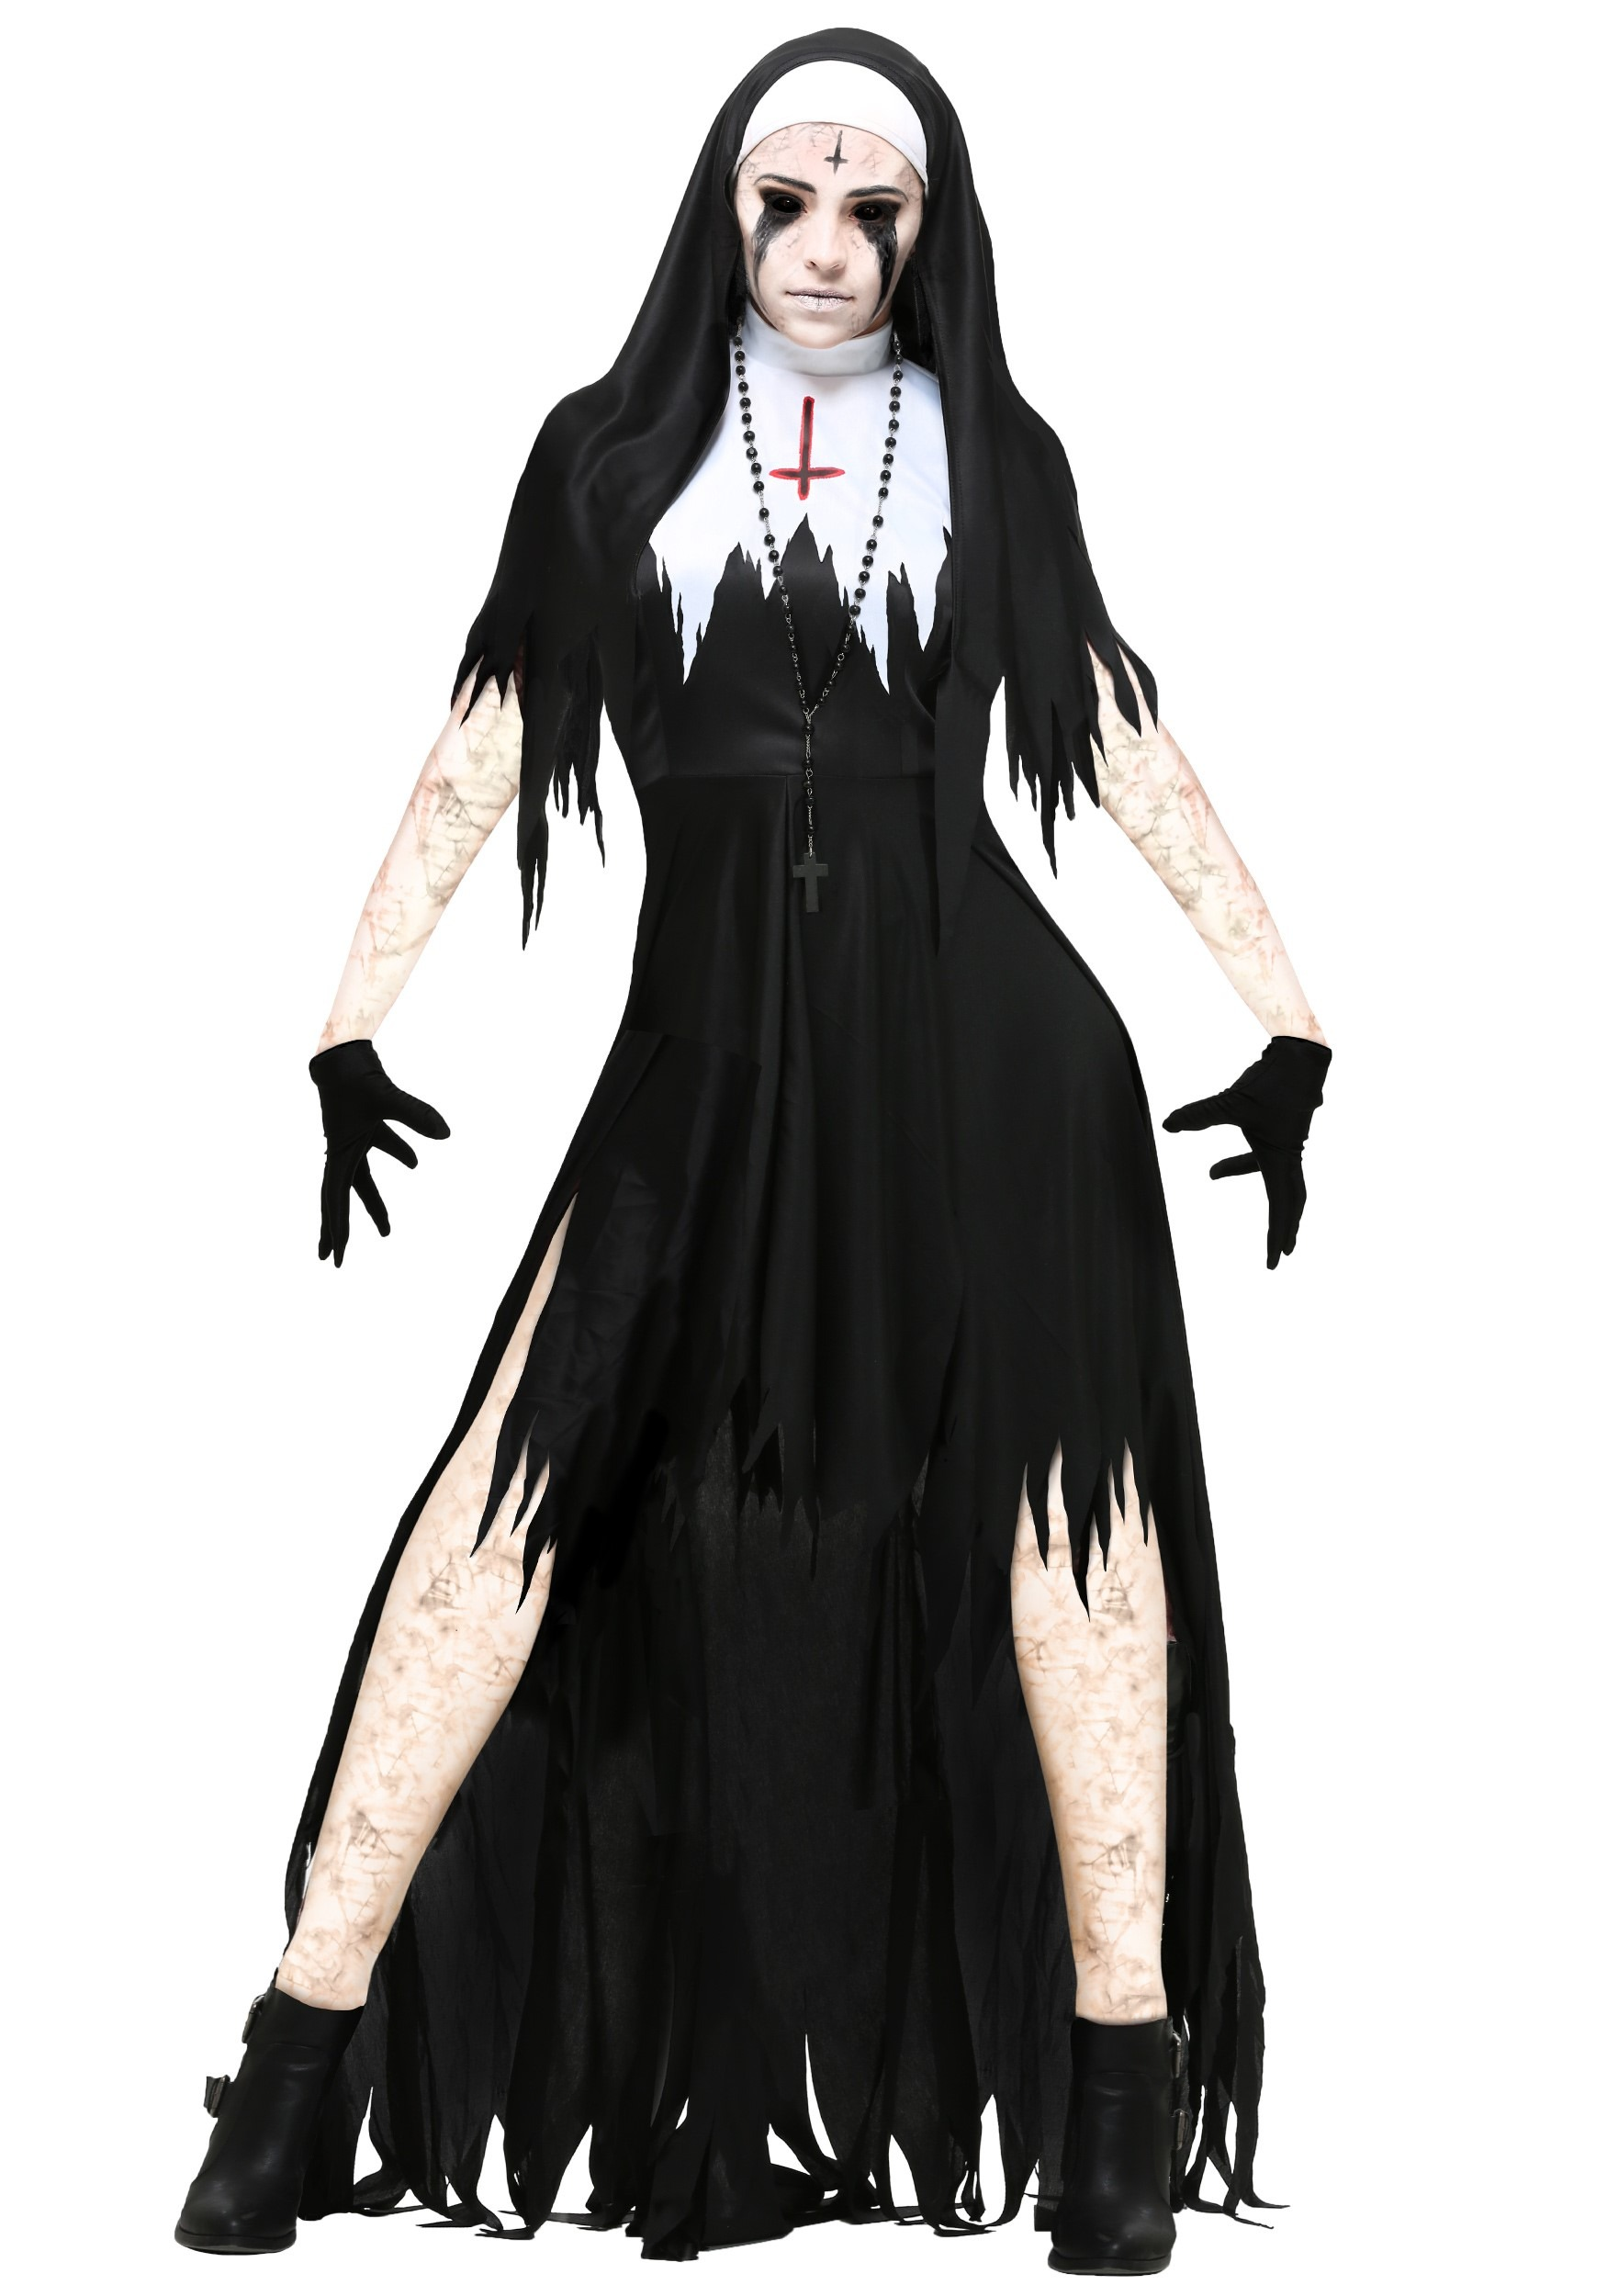 Dreadful Nun Costume for Women